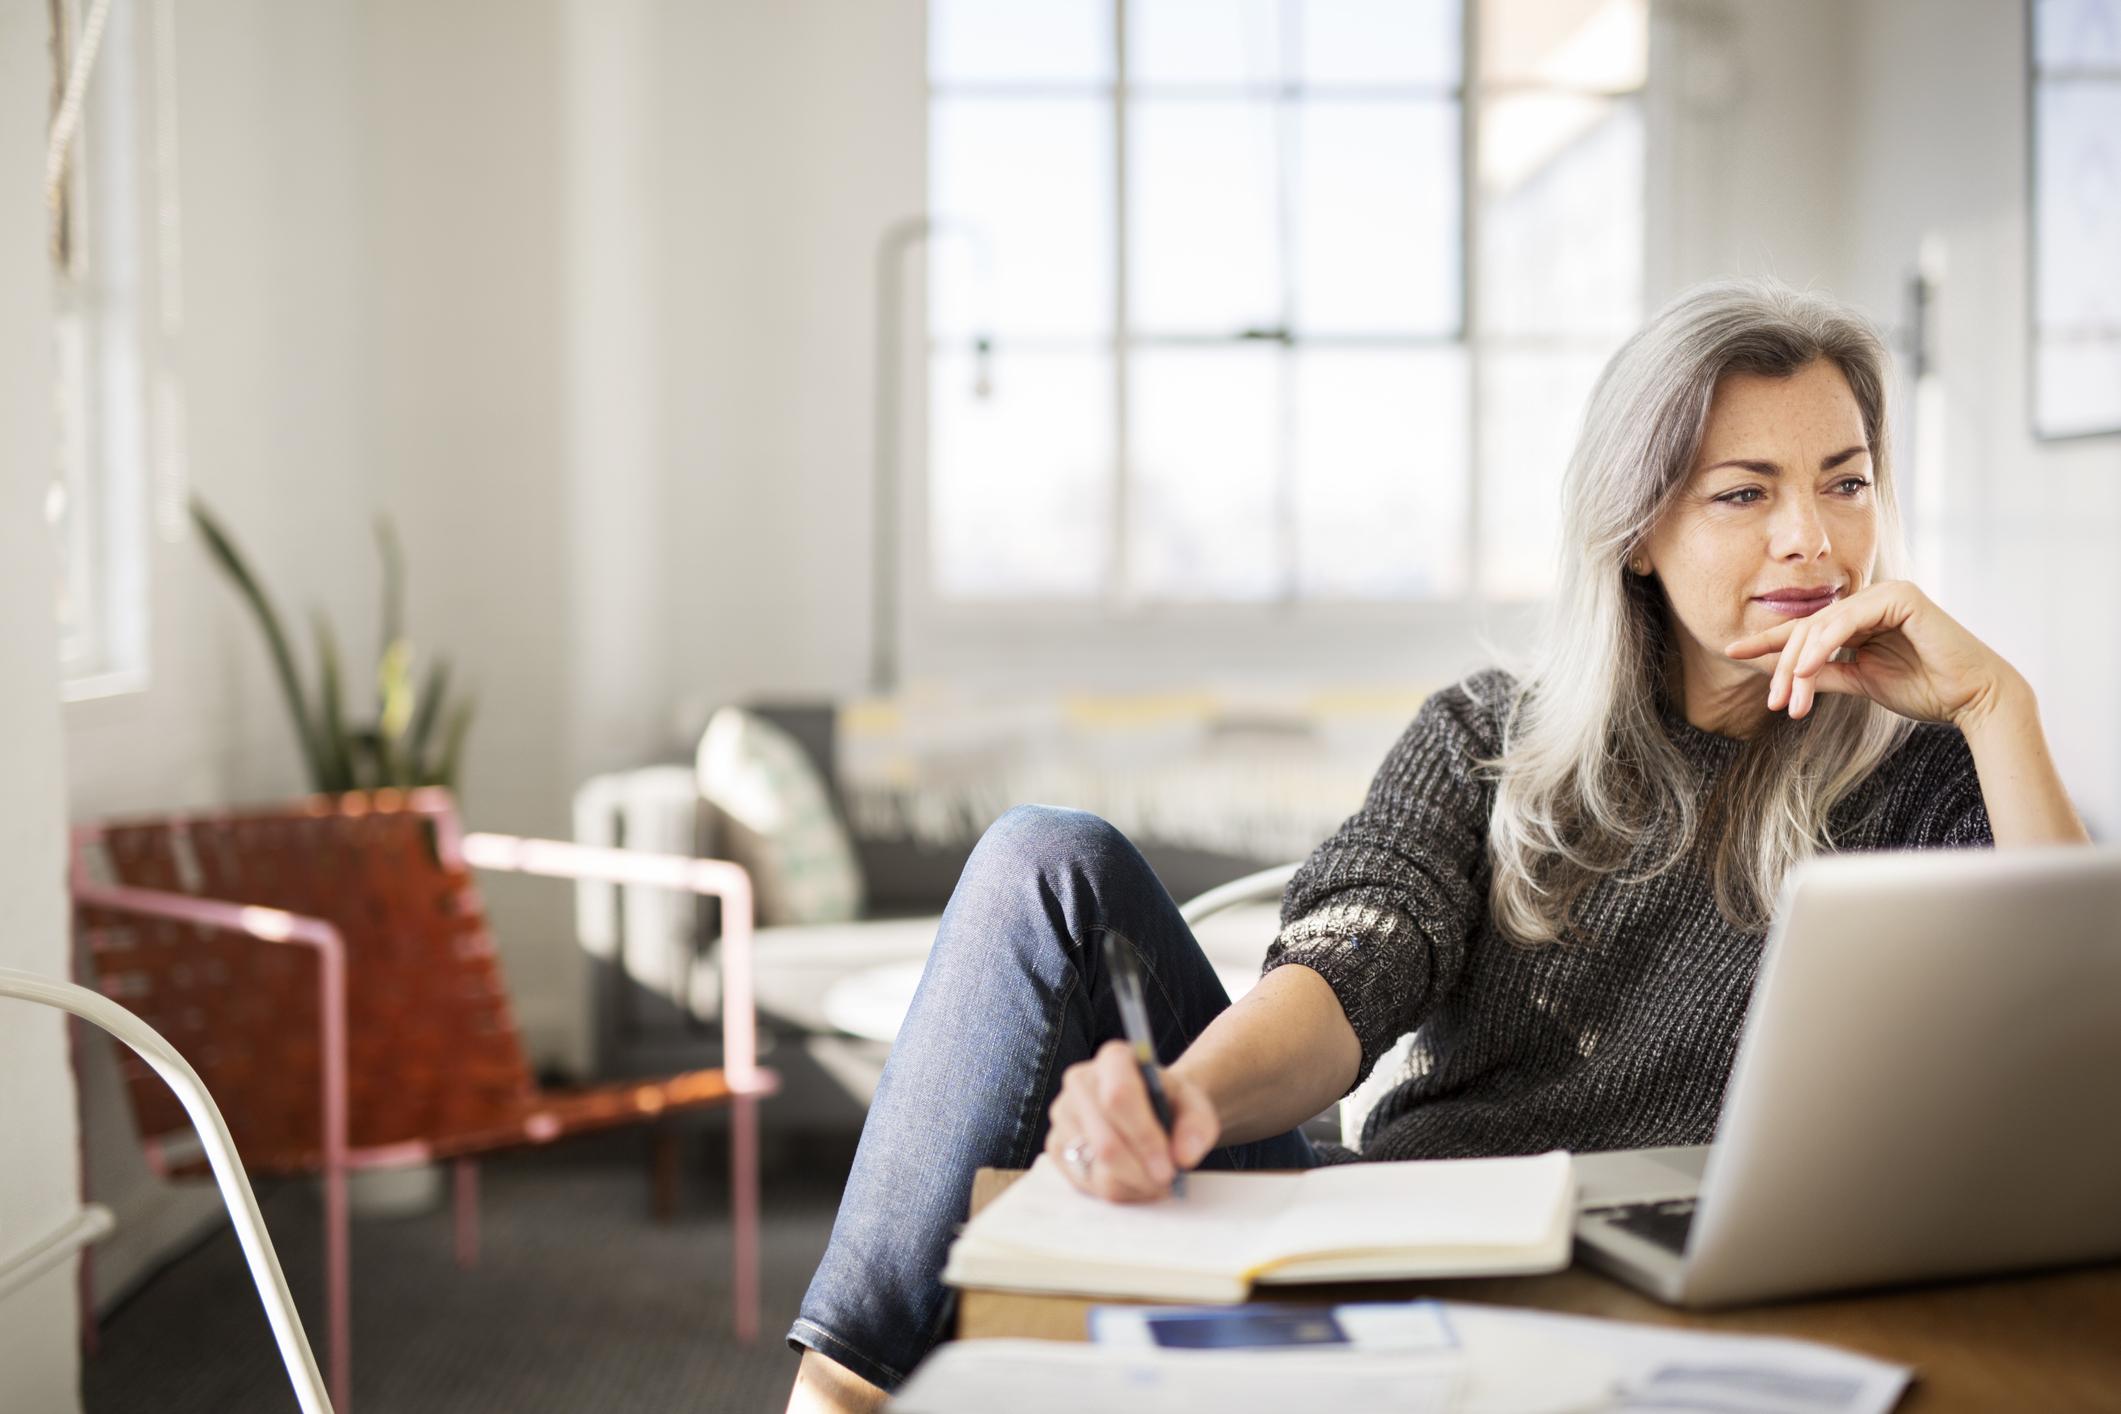 woman writing writer